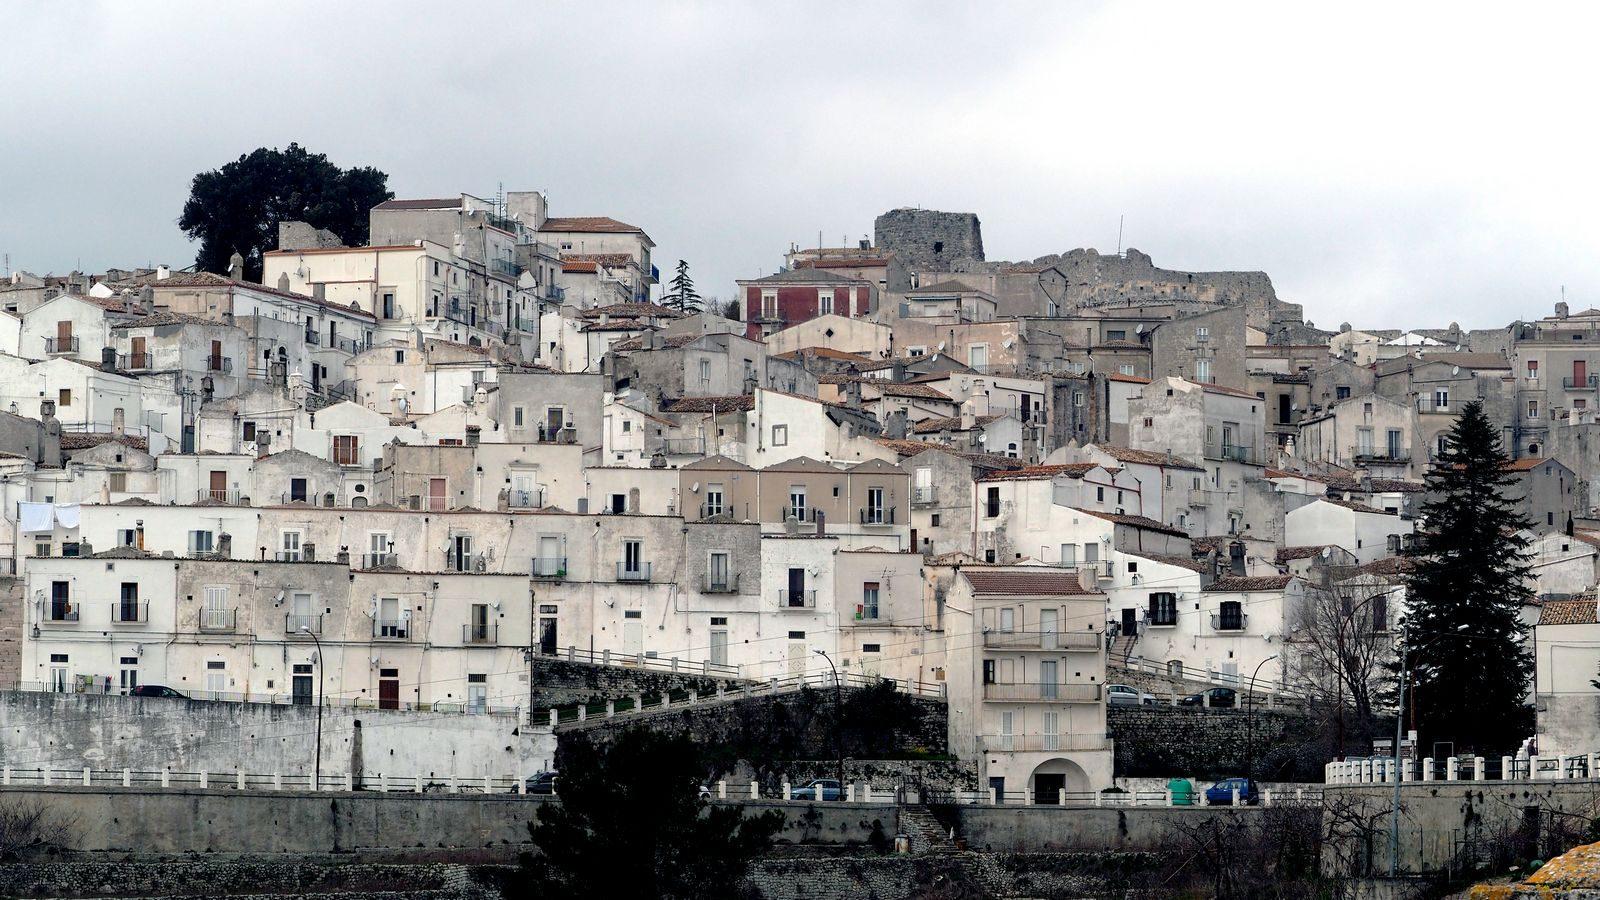 Monte Sant'Angelo (Gargano)